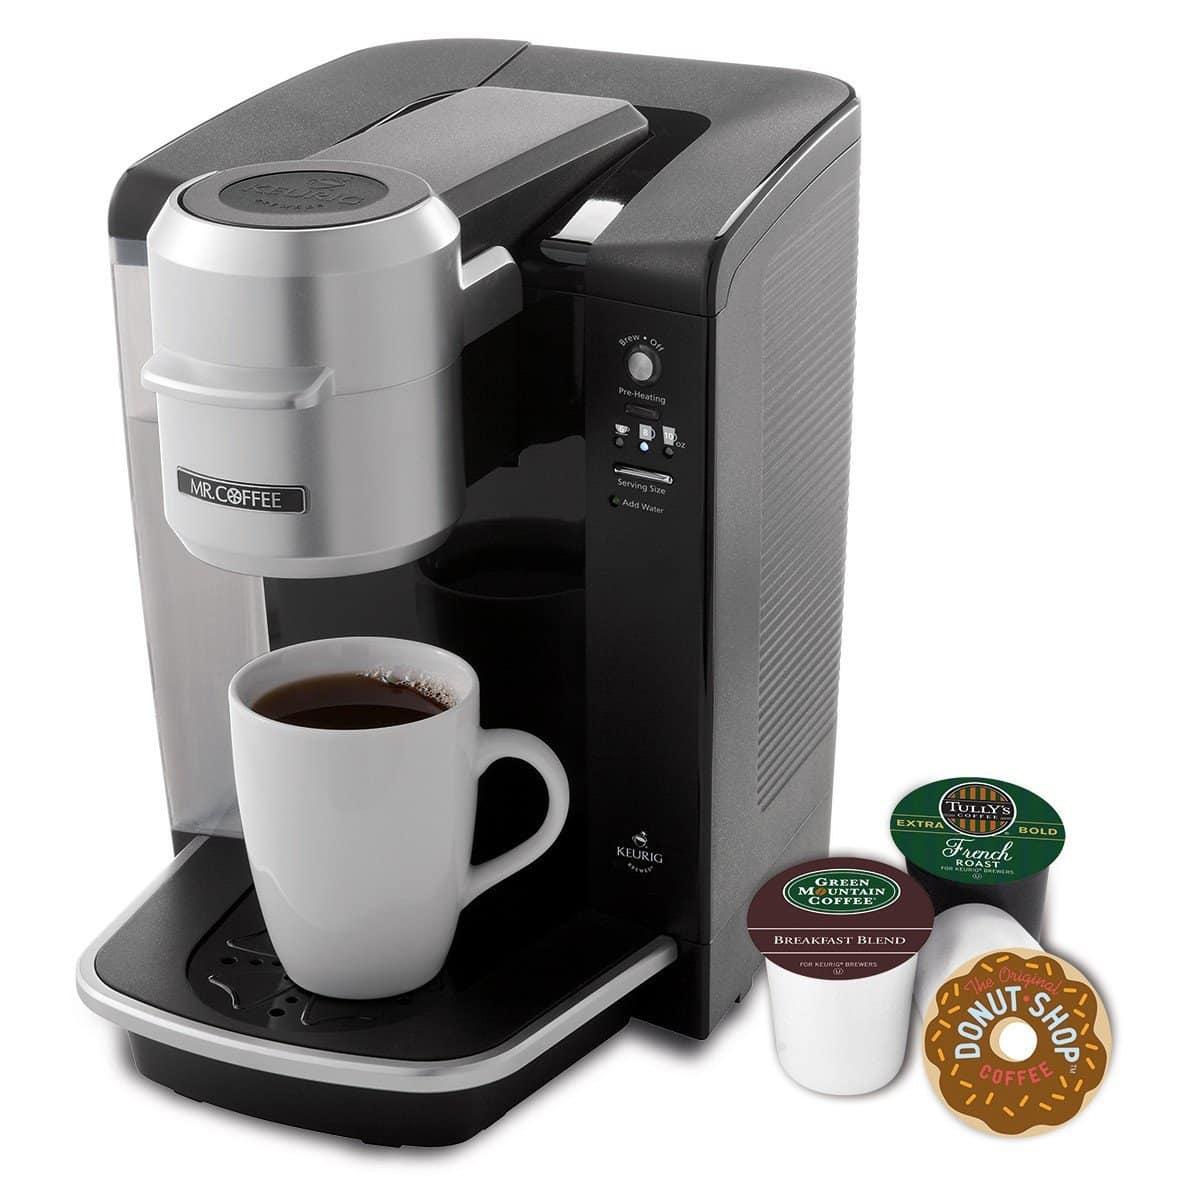 Mr. Coffee BVMC-KG6-001 Single Serve Coffee Brewer